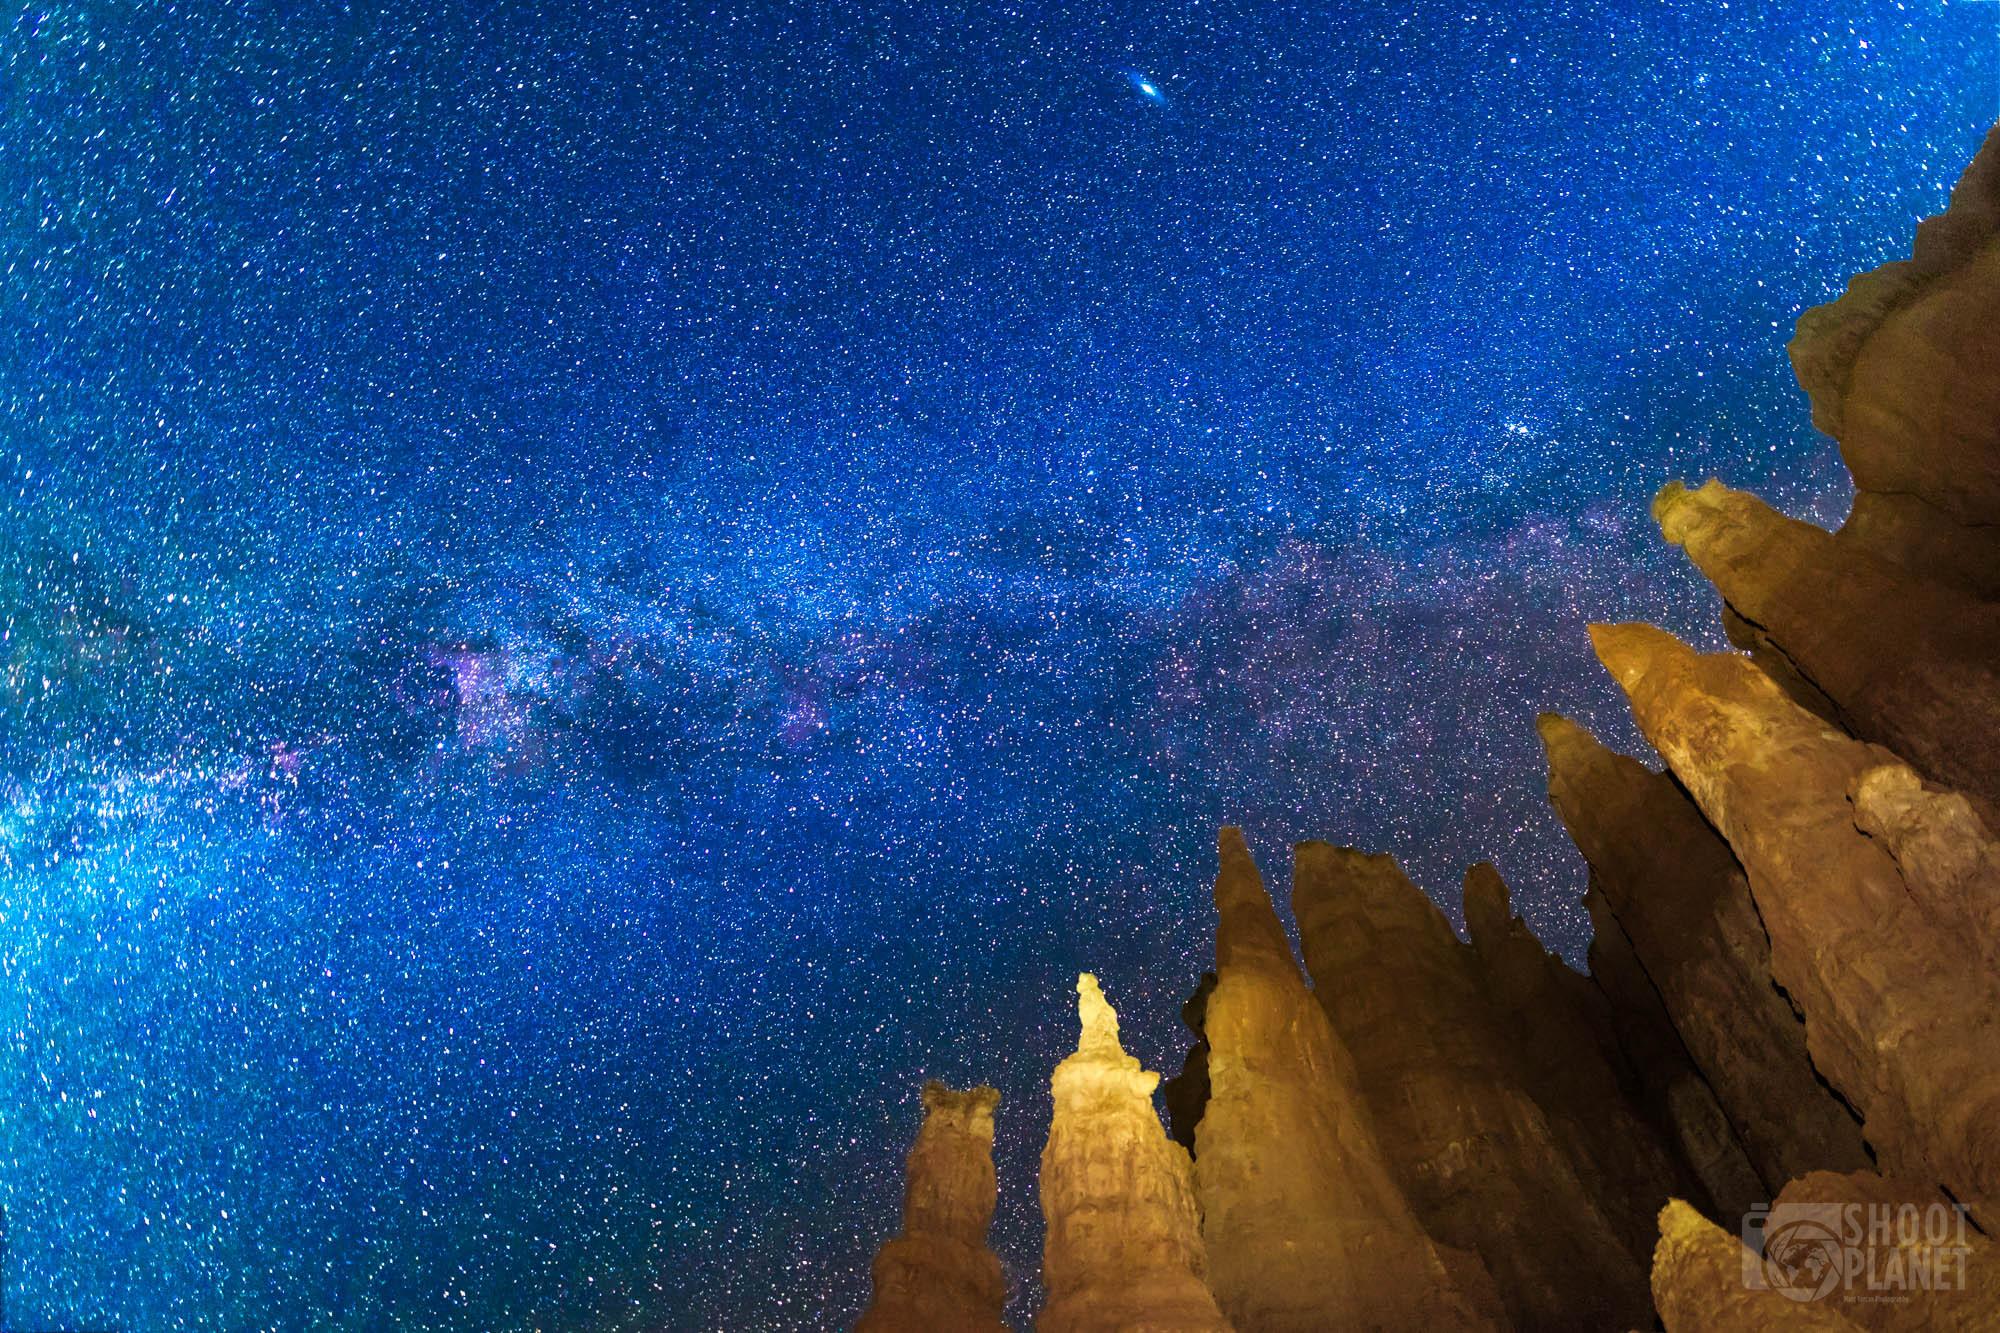 Bryce Canyon Milky Way lit-up rocks, USA